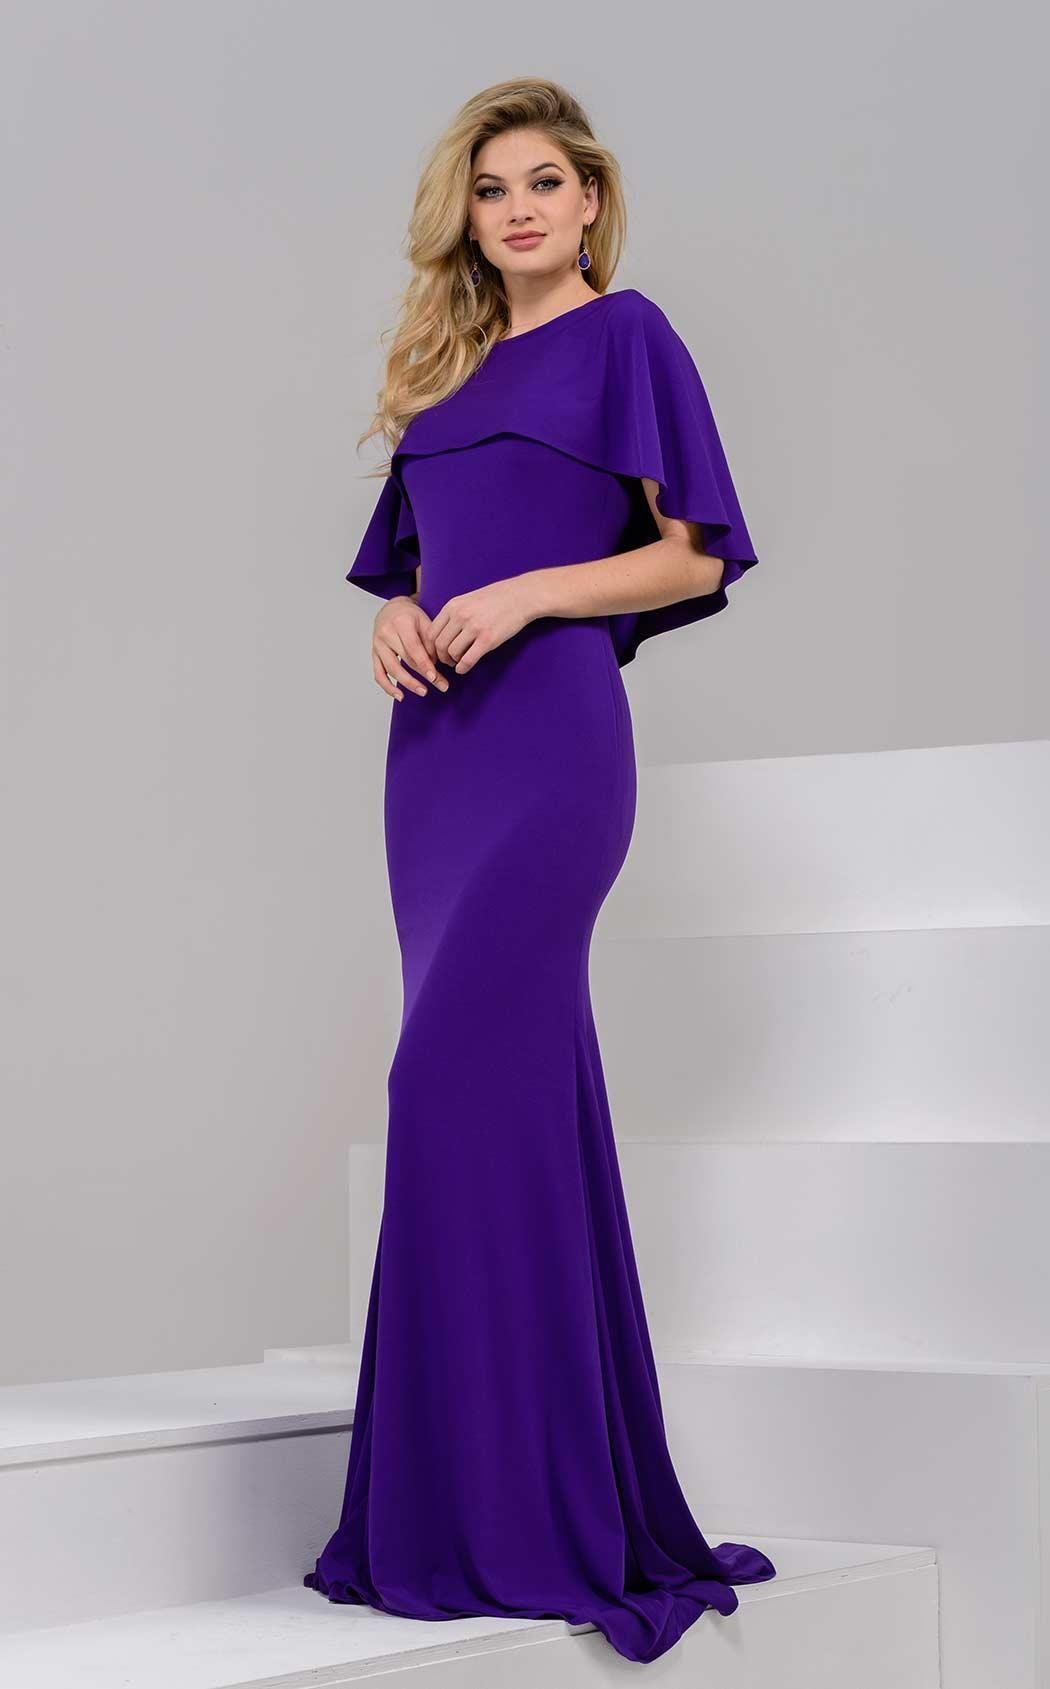 Pin By Cece El Kishky On Evening Dresses Cape Dress Long Prom Dresses Jovani Dresses [ 1689 x 1050 Pixel ]